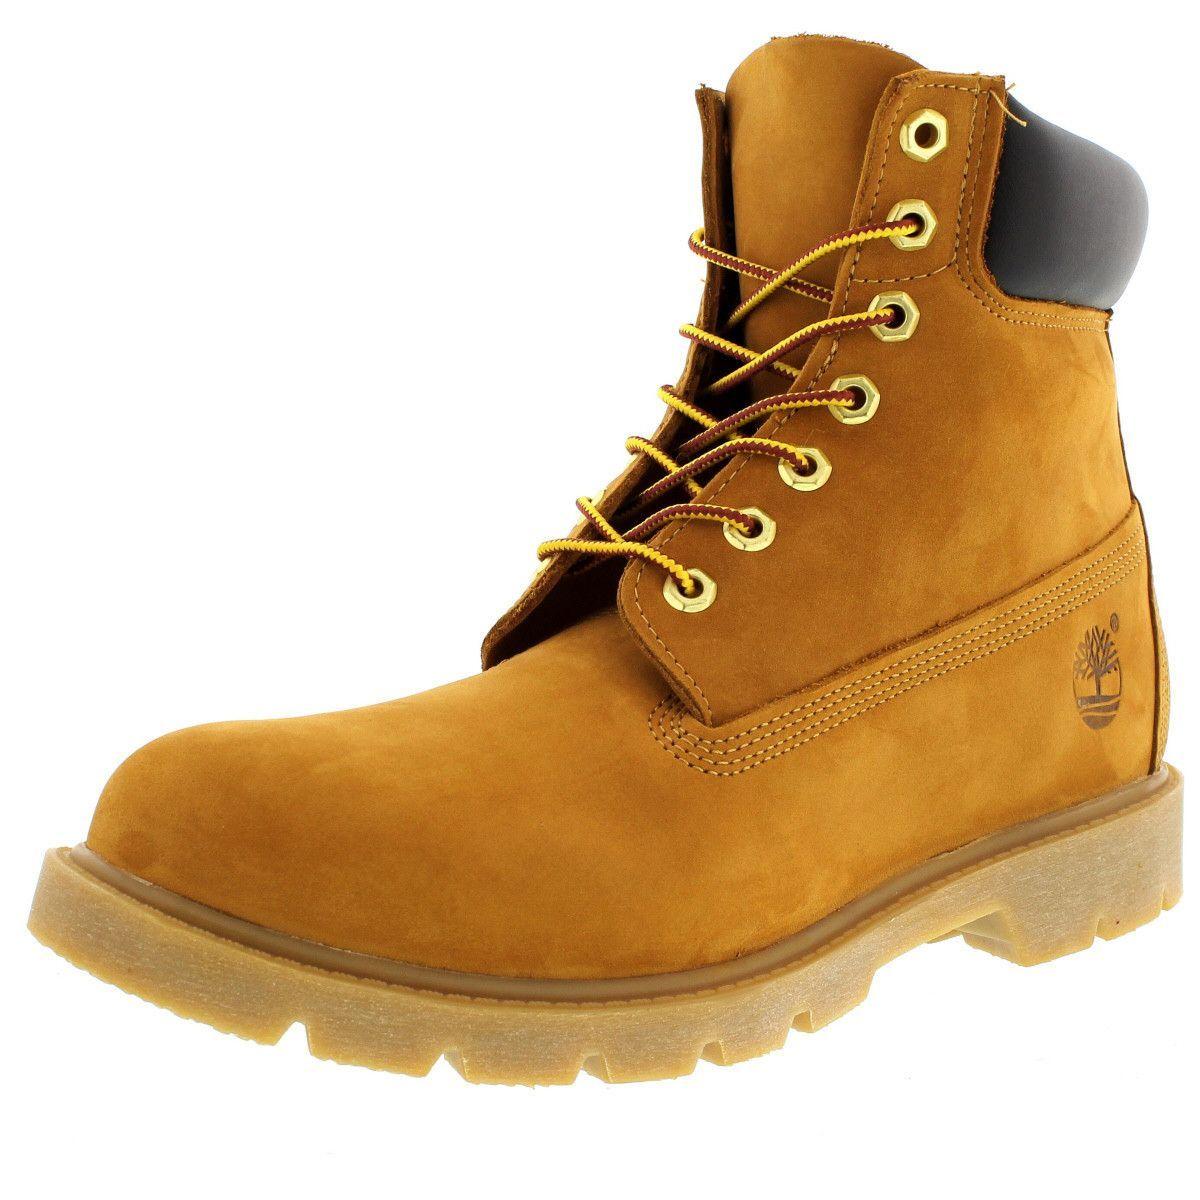 men's timberland 6 inch boots nubuck wheat white sole